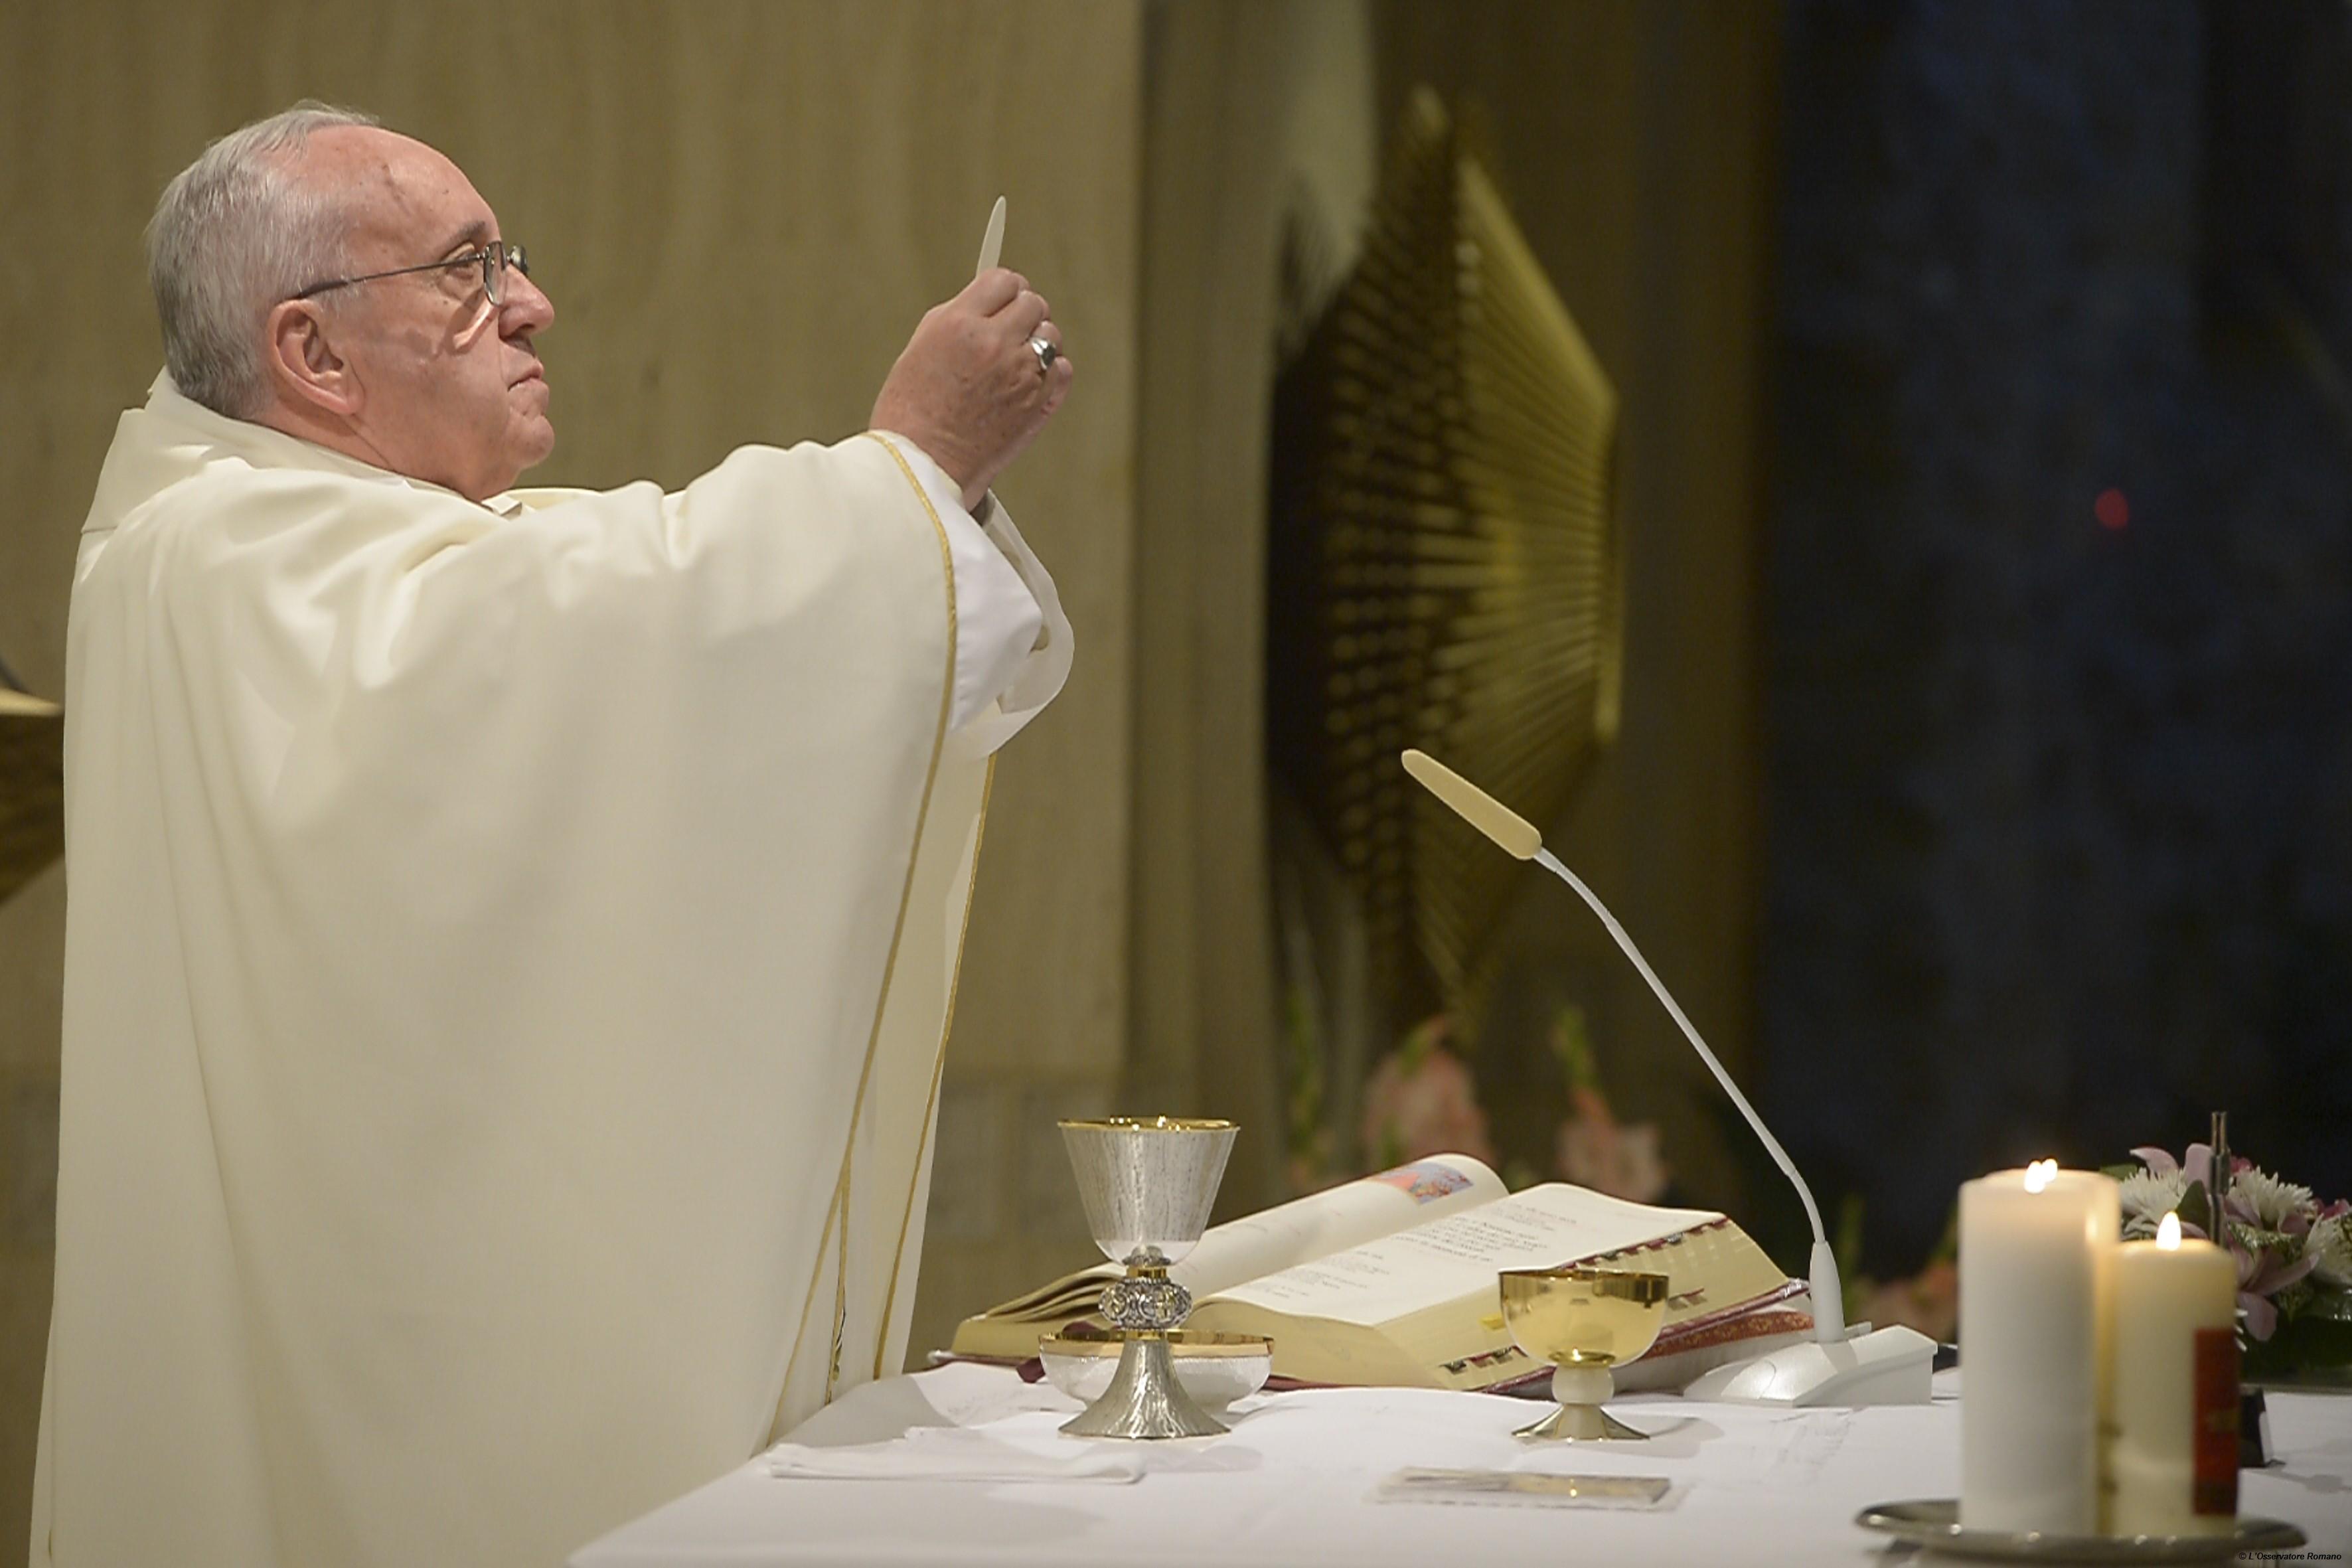 Pope Francis celebrates Morning Mass in the Domus Sanctae Marthae